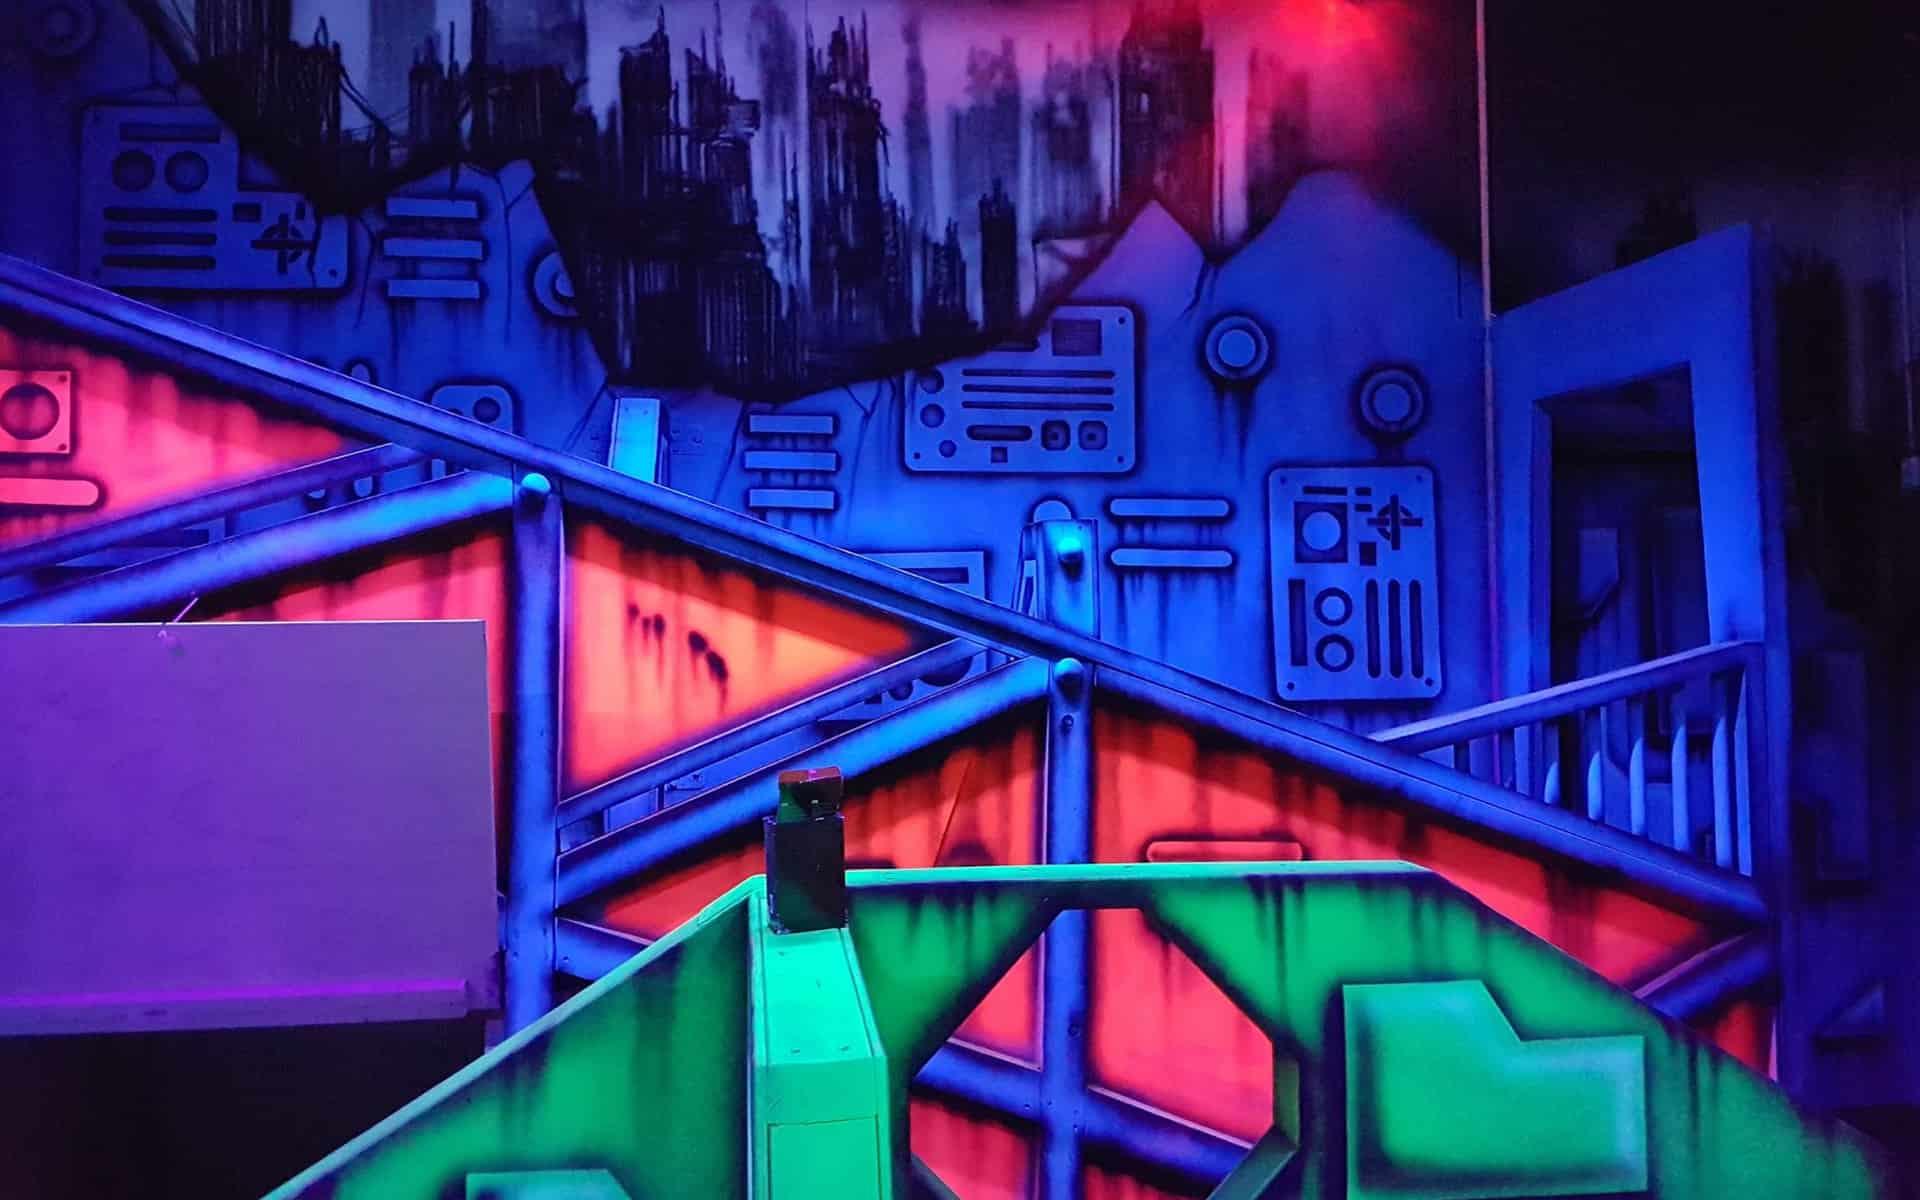 laser-tag-UV-mural-gary-drew